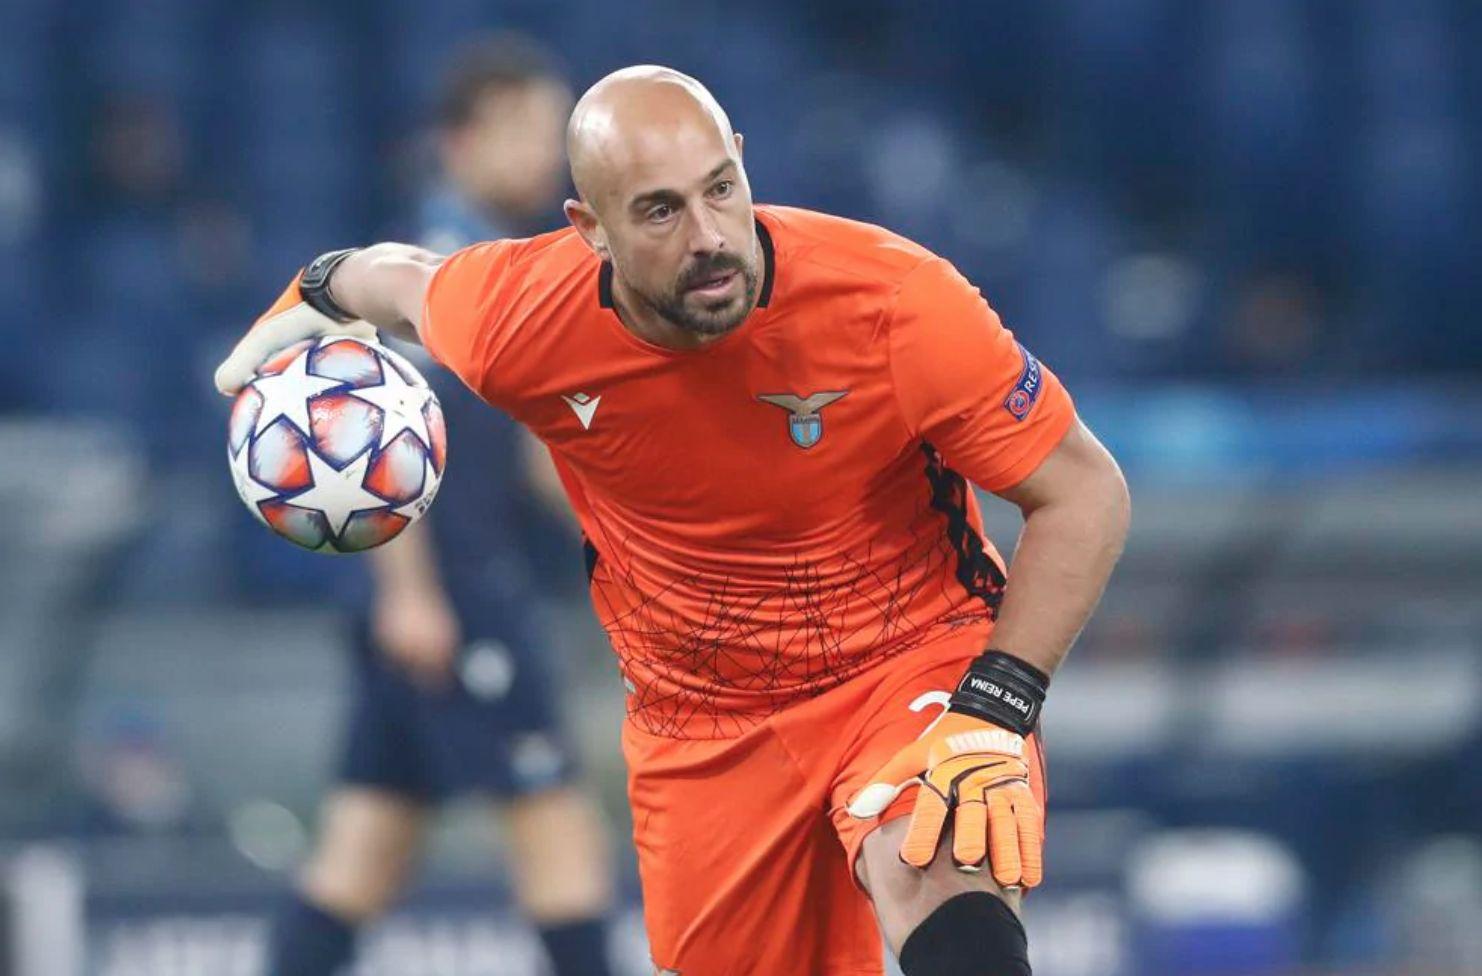 A importância de Reina na saída de bola da Lazio